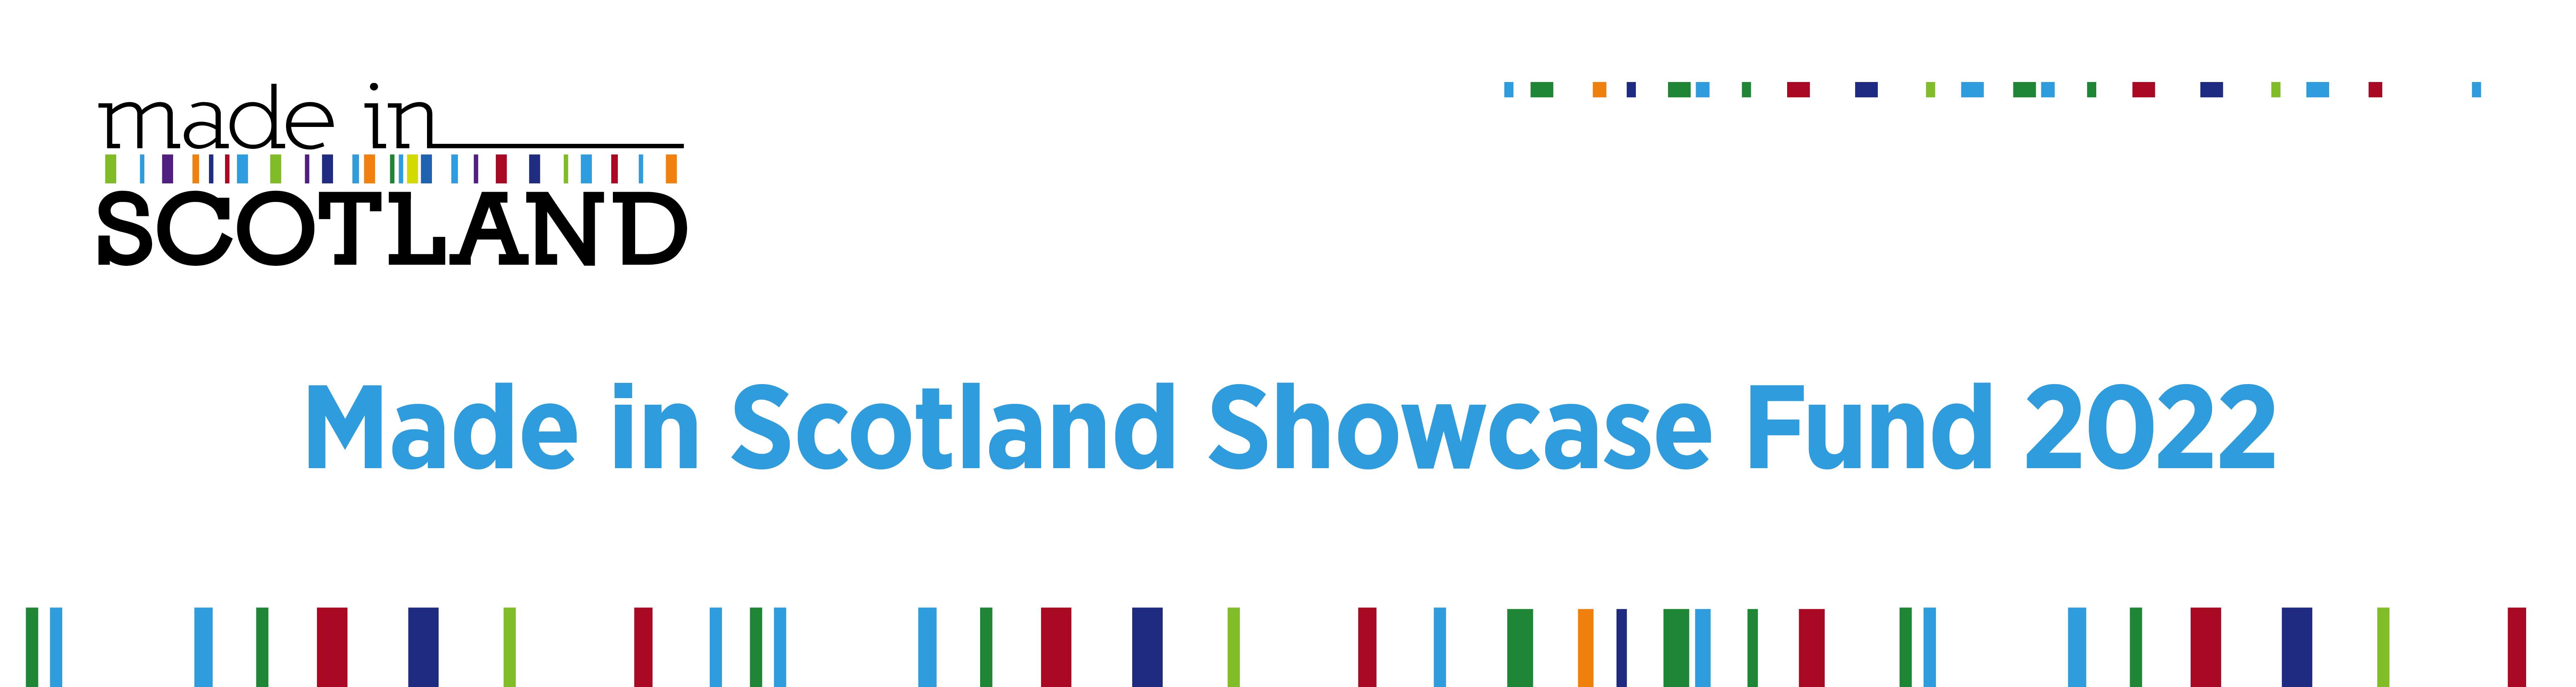 Made in Scotland showcase fund 2022